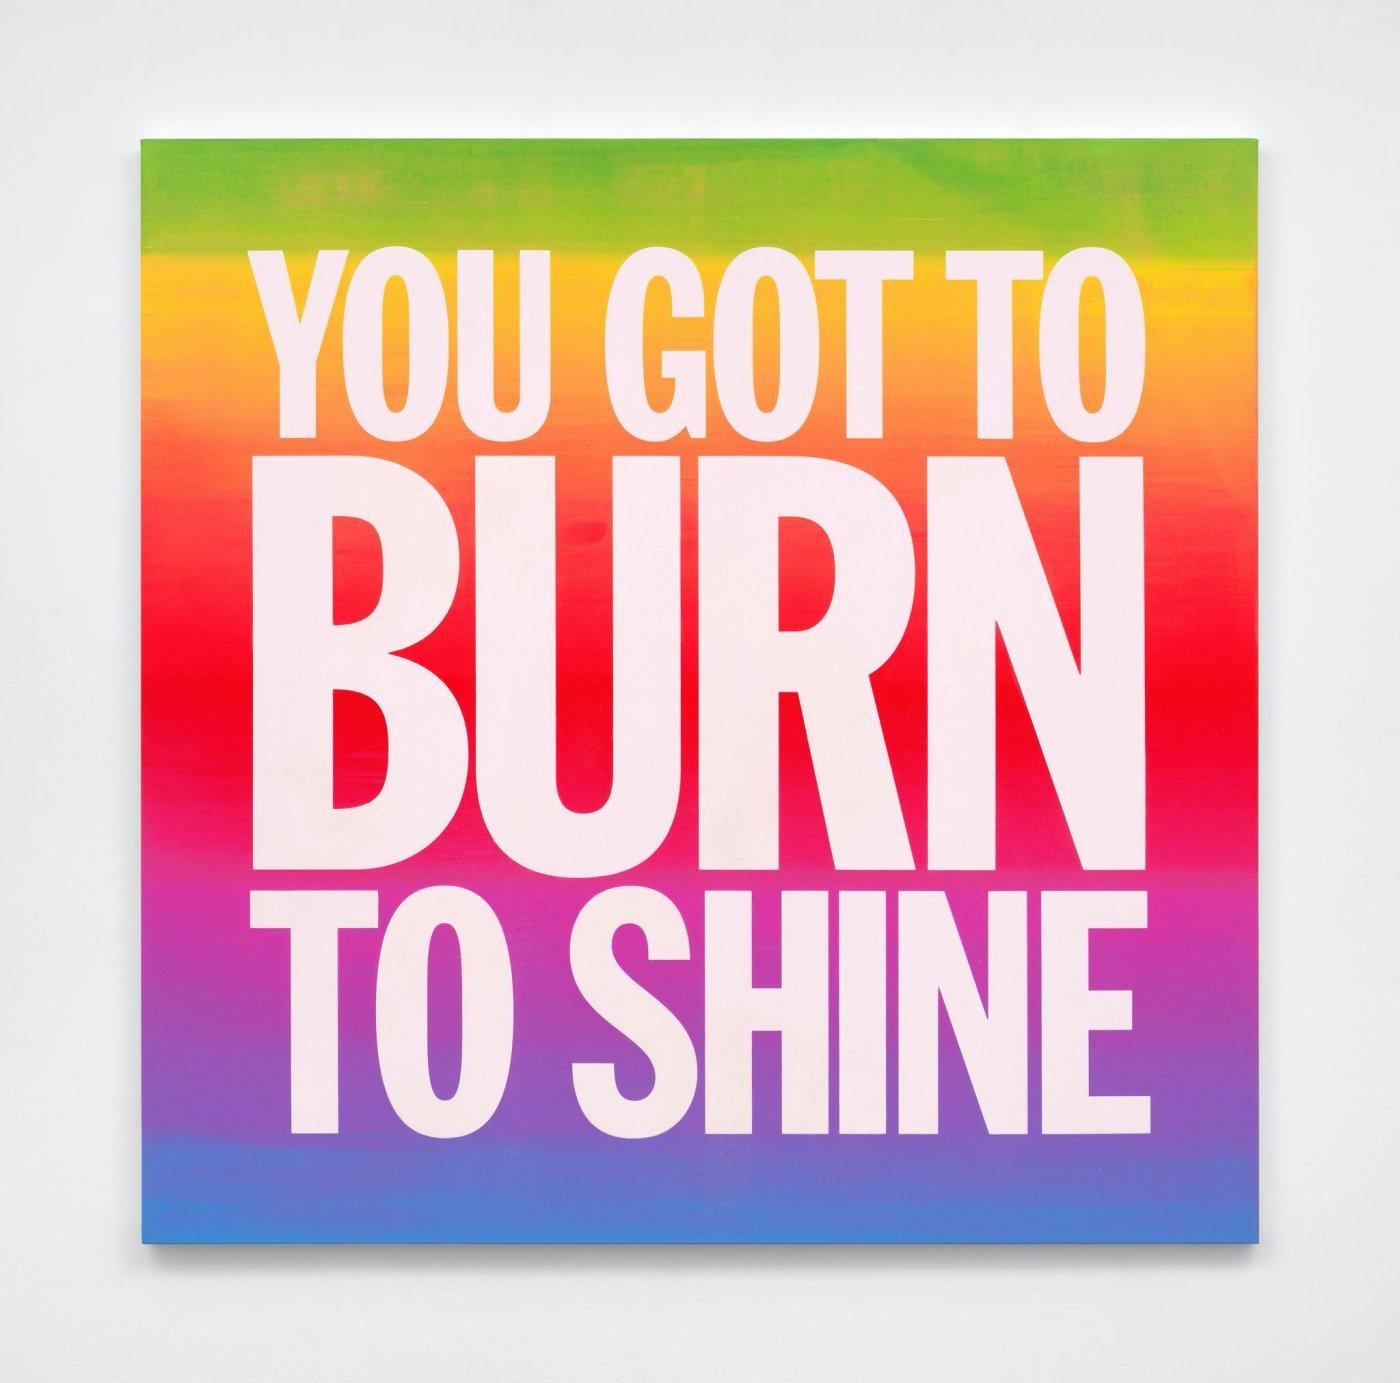 YOU GOT TO BURN TO SHINE